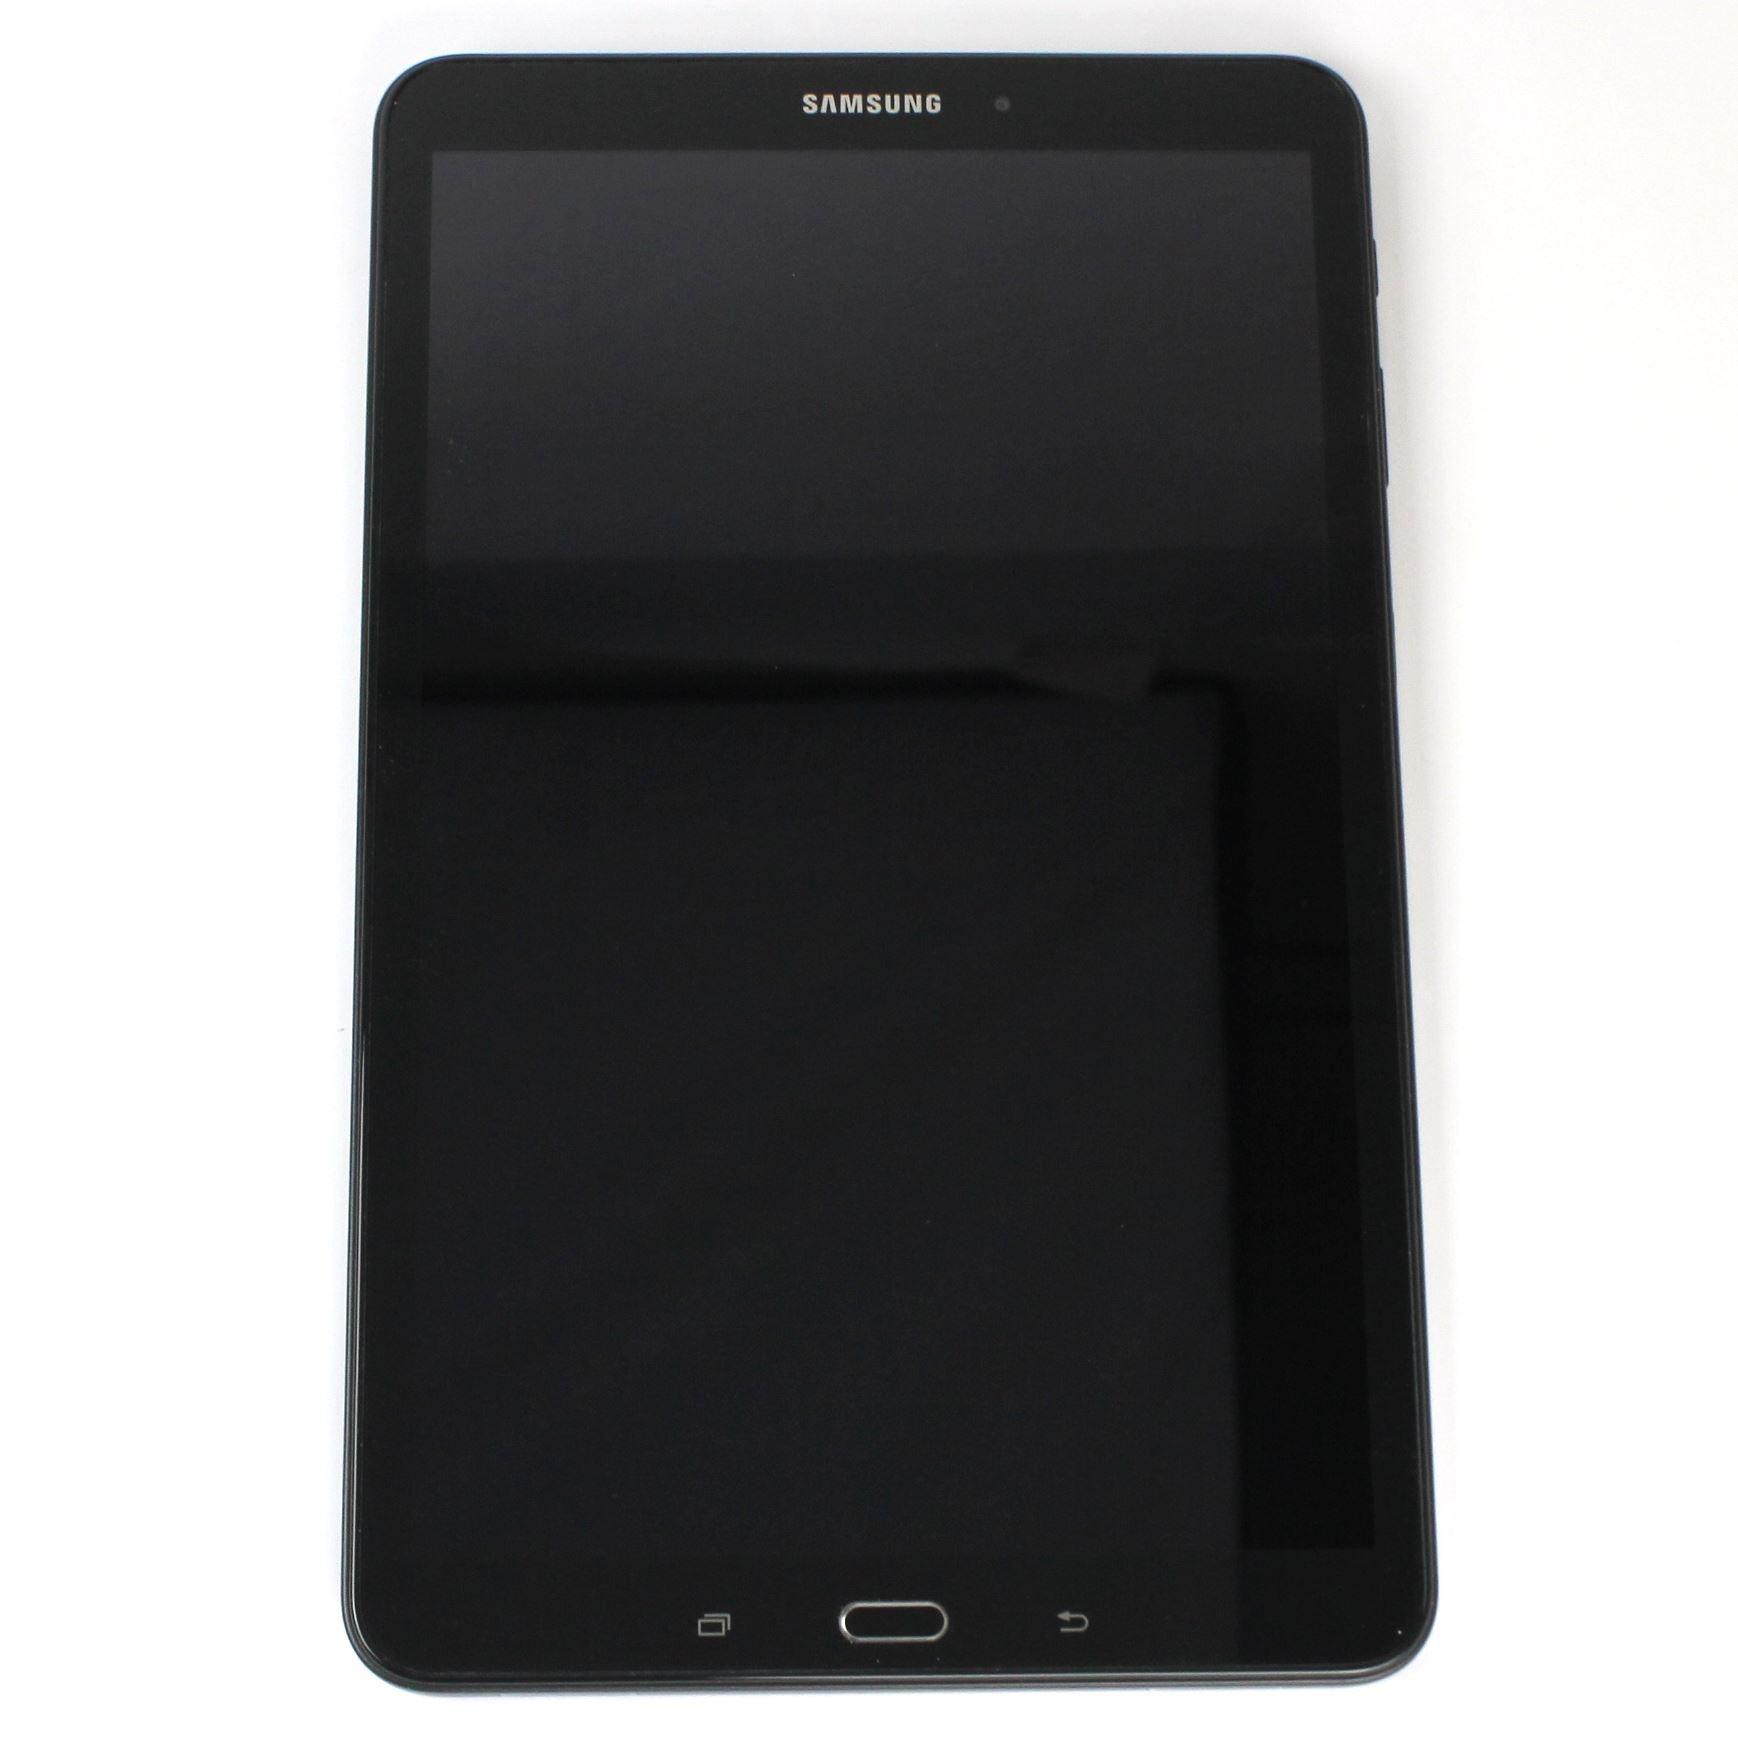 samsung galaxy tab a6 2016 10 1 sm t585 16gb 4g lte wifi unlocked tablet black ebay. Black Bedroom Furniture Sets. Home Design Ideas